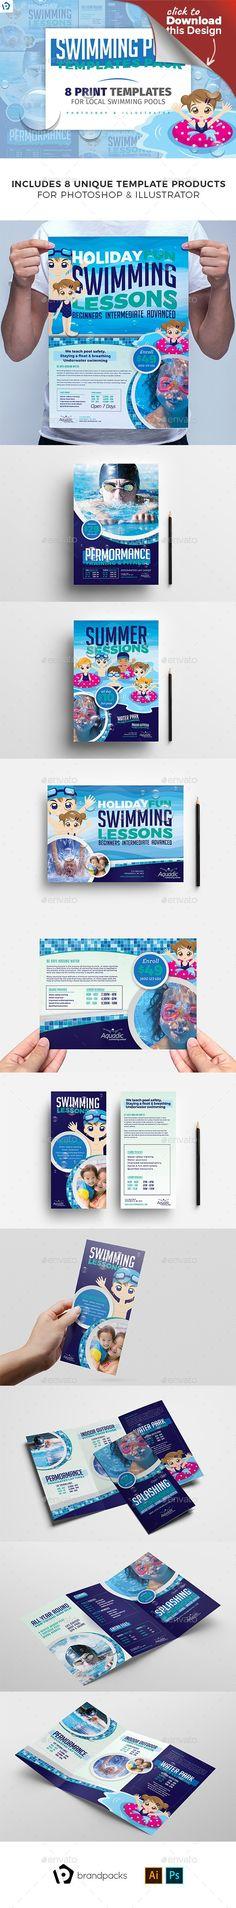 ai, banner, BrandPacks, brochure template, dl, flyer, illustractor, leaflet, outdoor pool, pamphlet, photoshop, pool, poolside, poster, psd, rack card, swim lessons, swim school, swimming, swimming bath, swimming baths, swimming centre, swimming club, swimming lesson, swimming pool, template, tri fold, trifold Swimming Centre Templates Bundle for Adobe Photoshop & Adobe Illustrator   Create professional print advertisements, posters & flyers for swimming pools and schools to promot...